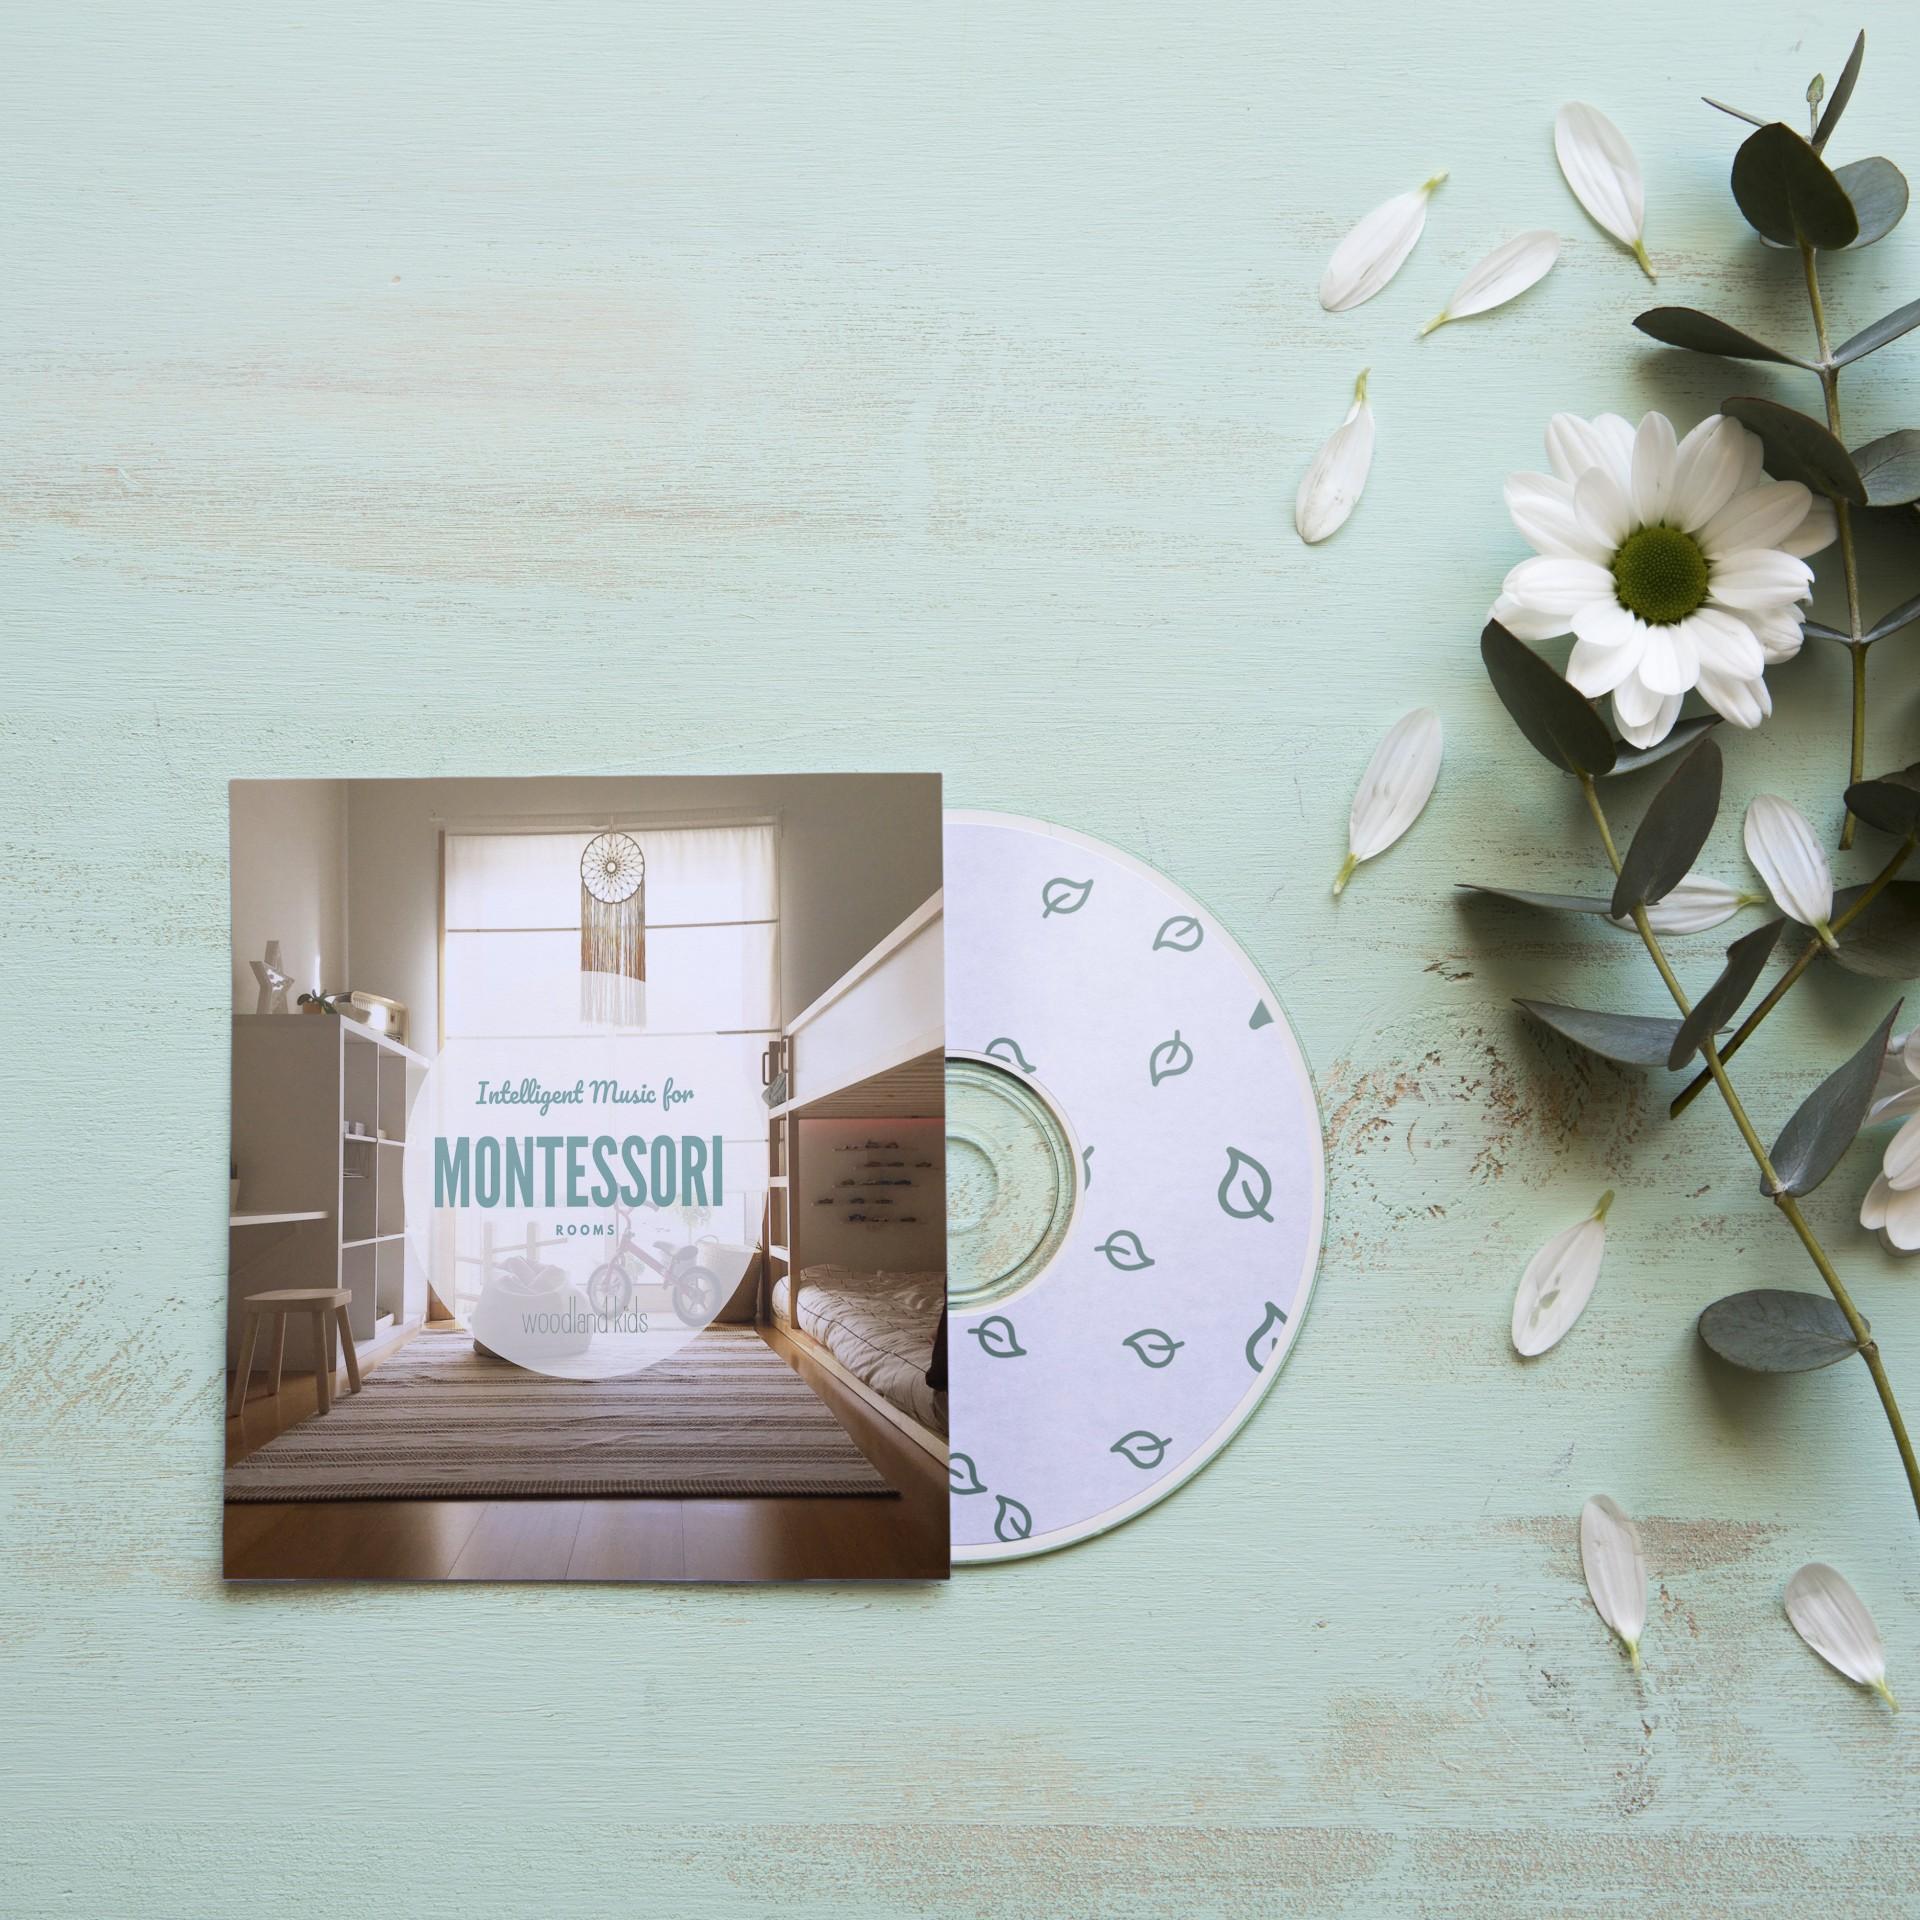 CD Música Inteligente para Salas Montessori - Woodland Kids